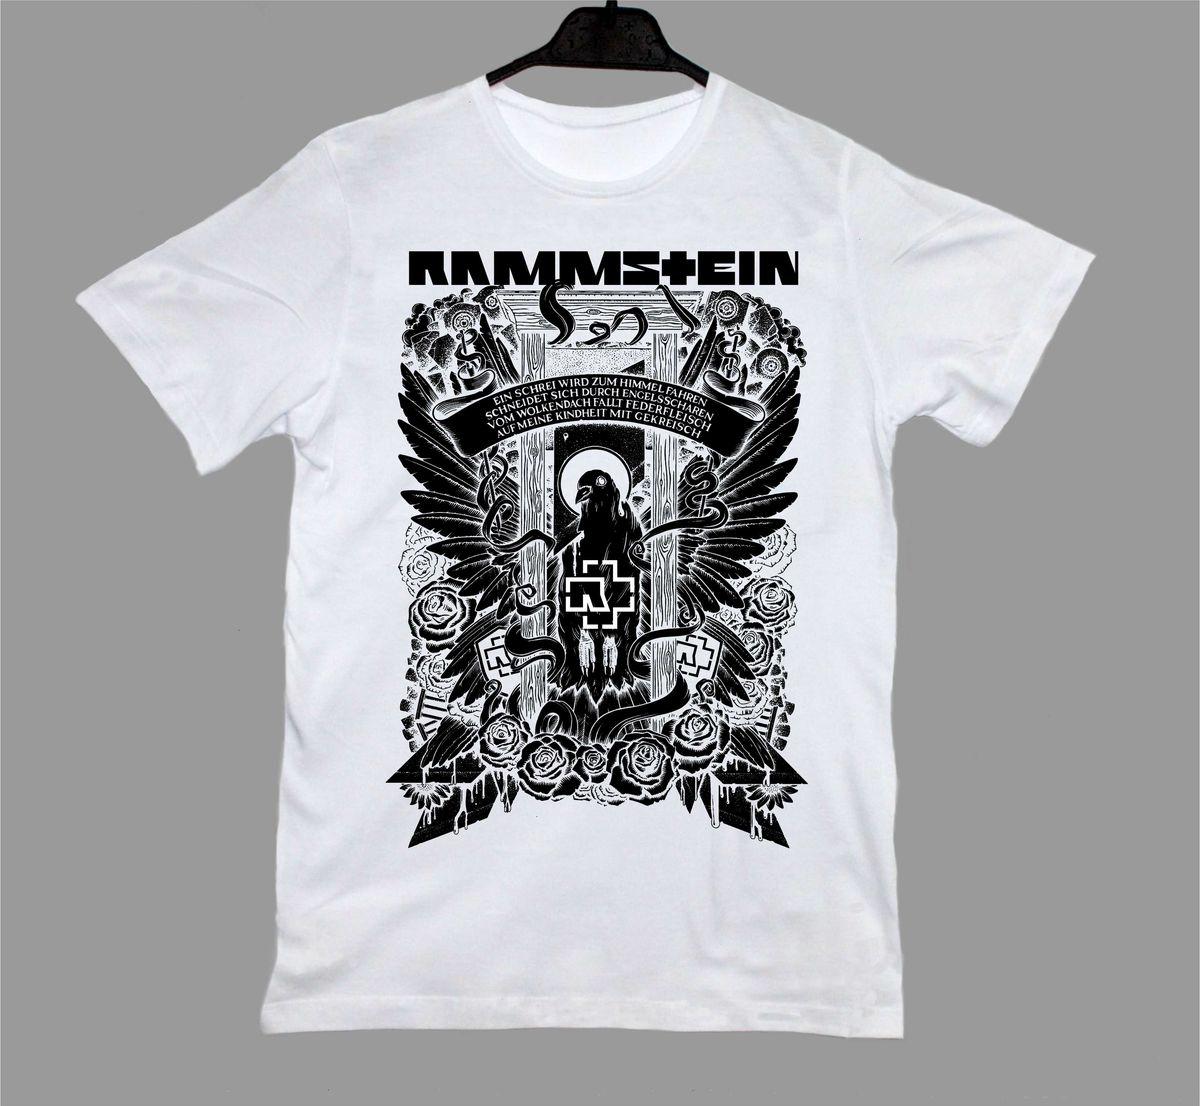 Rammstein Band T-Shirt – Metal \u0026 Rock